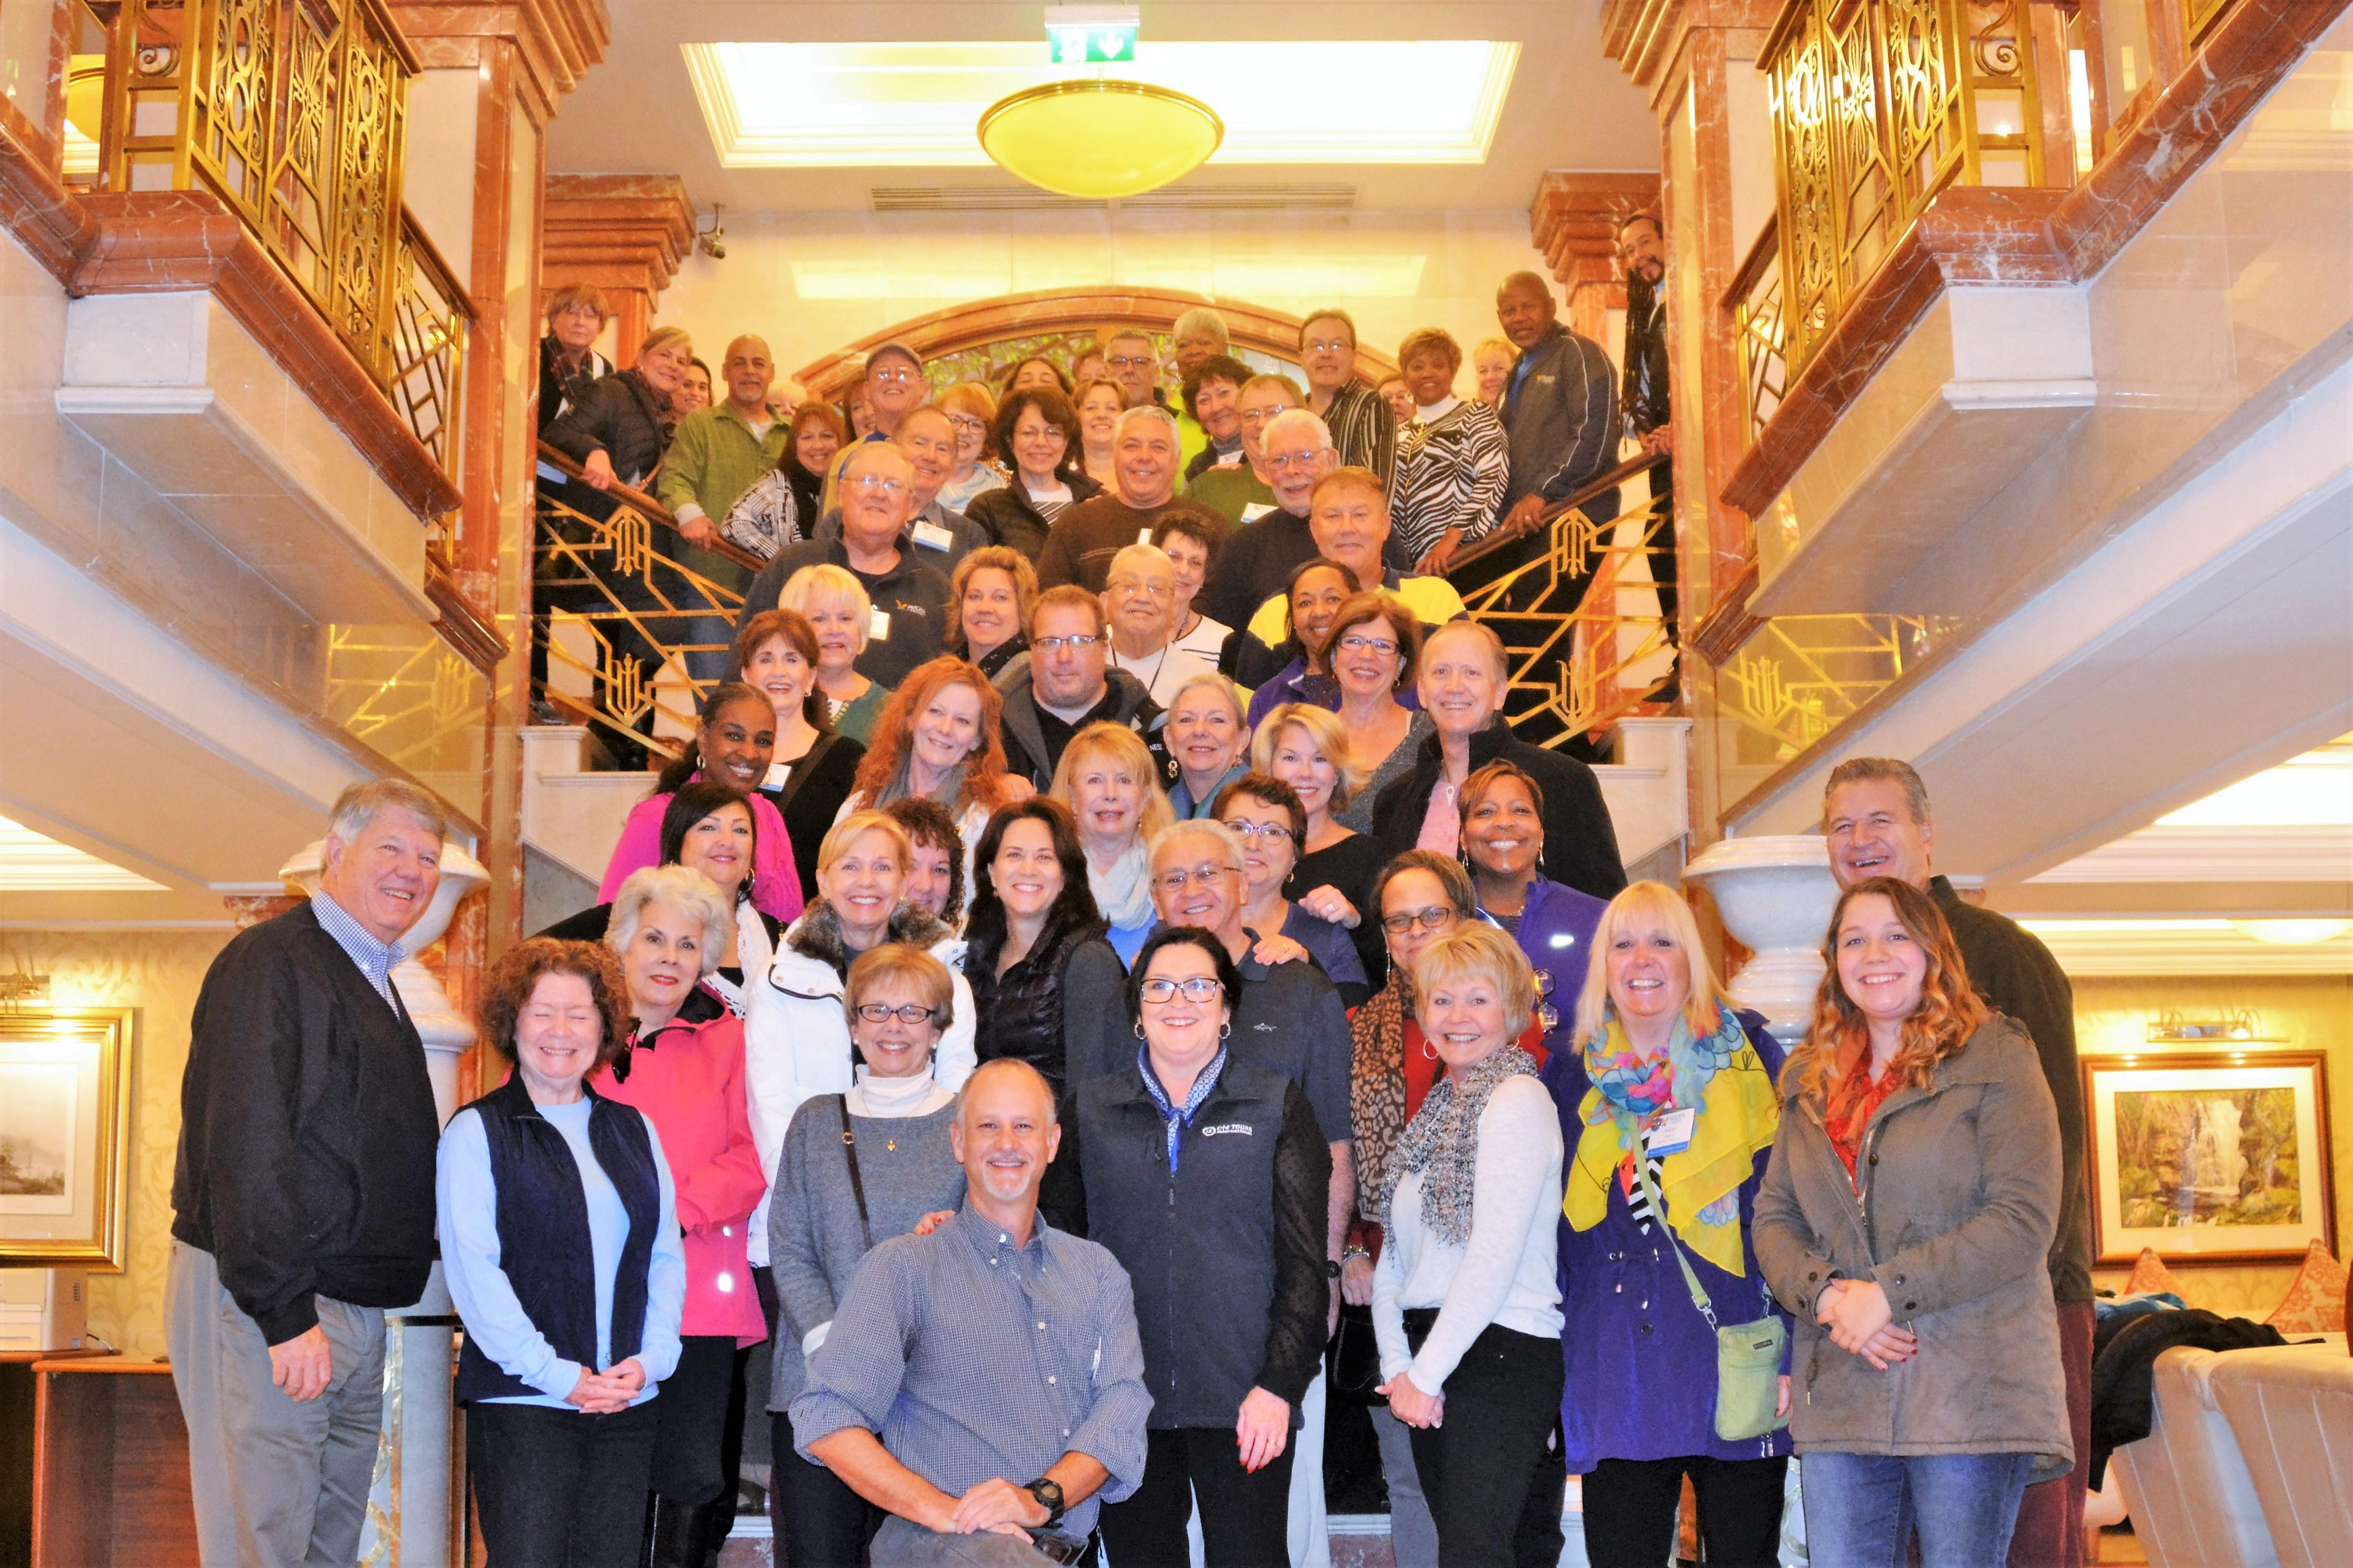 Top Avoya Travel Network Members on CIE Tours Award Trip in Ireland